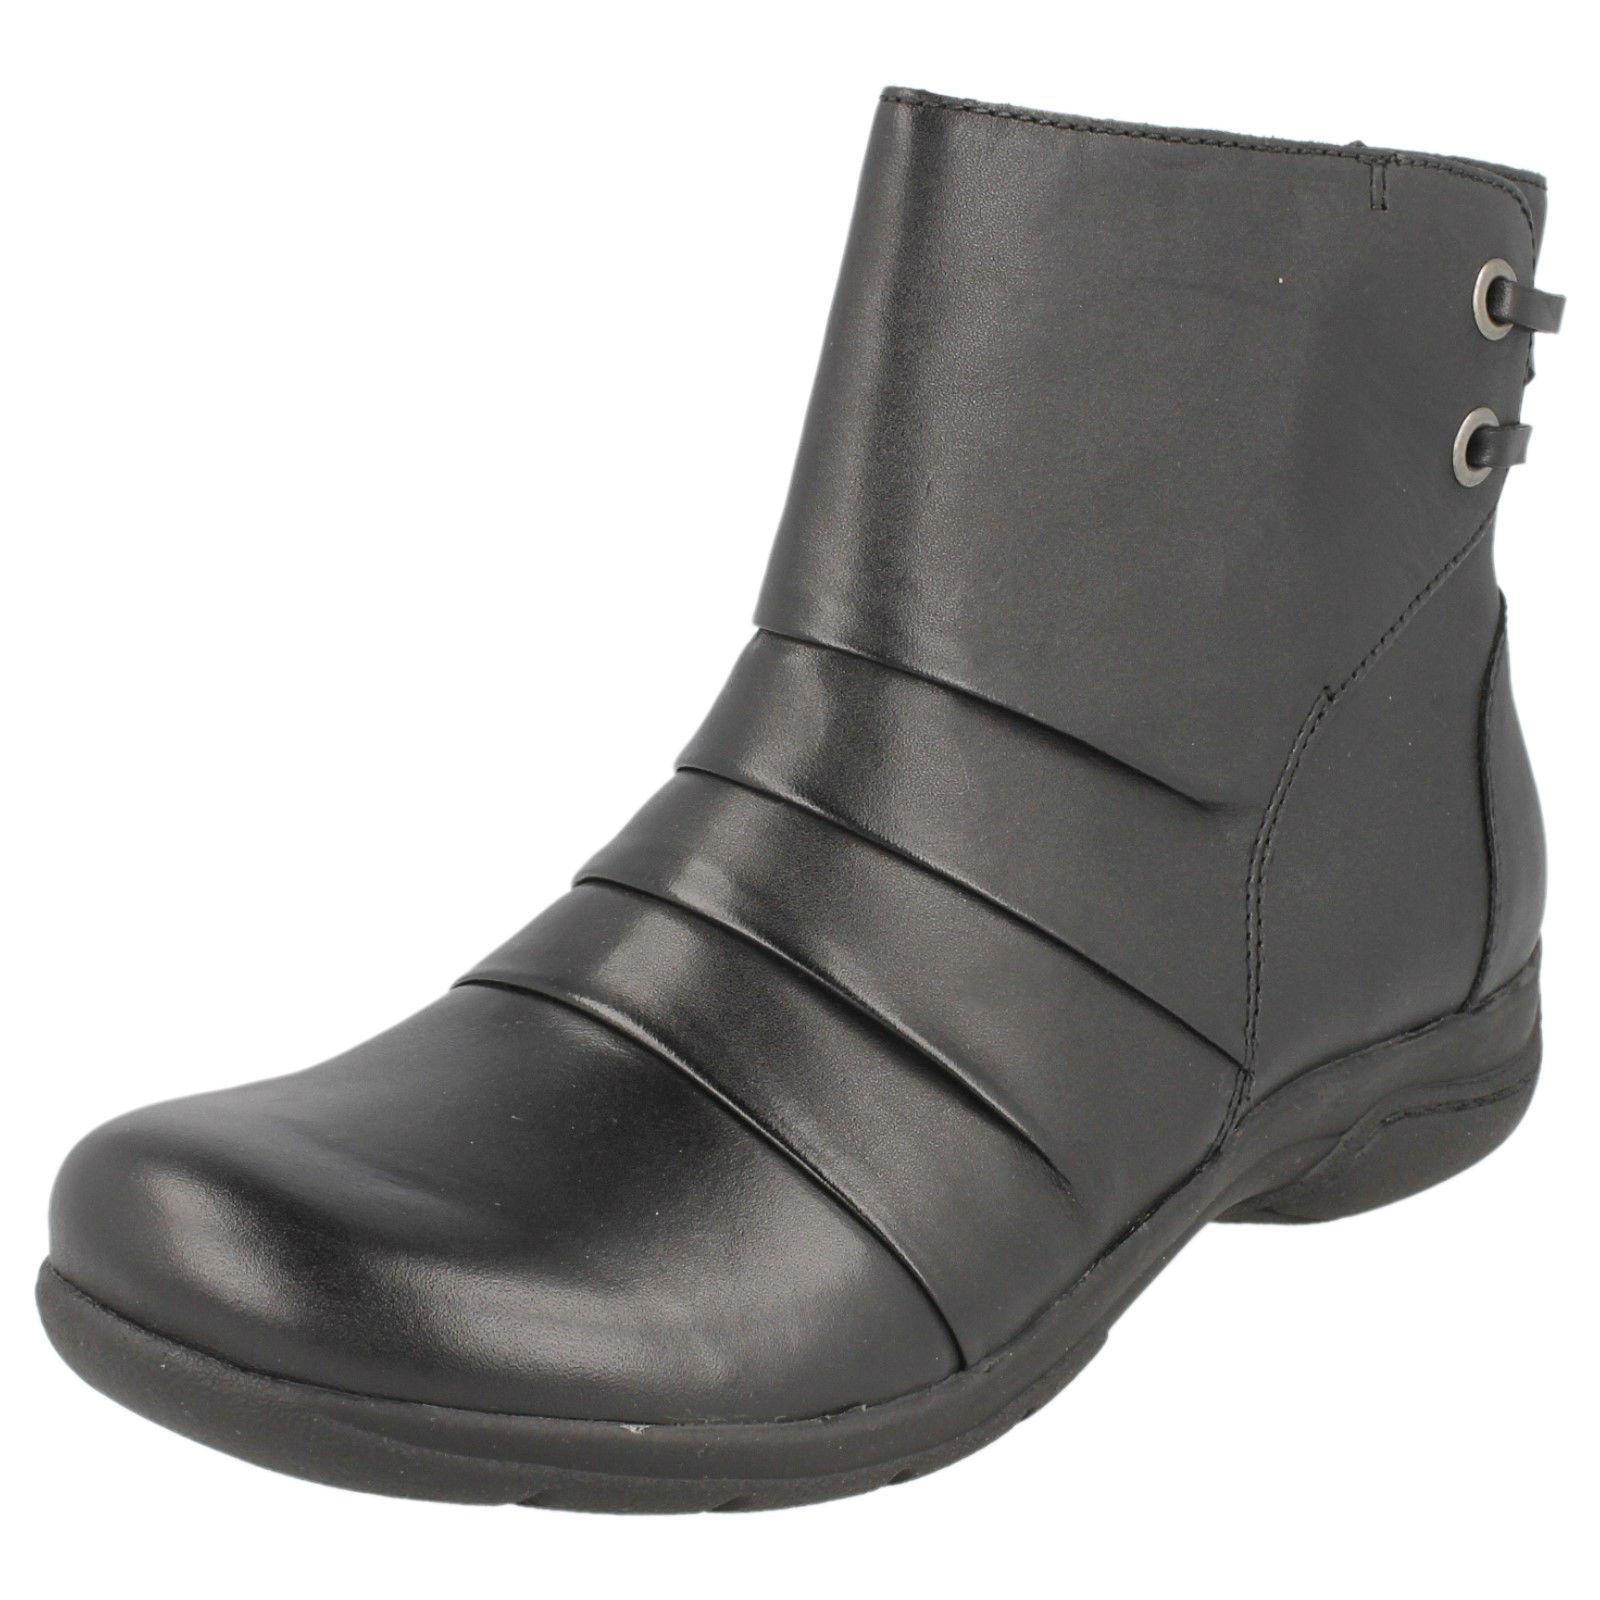 Clarks Mells Ruth femmes noir Bottines Cuir Cheville GB Taille 4 Largeur D (R5A)